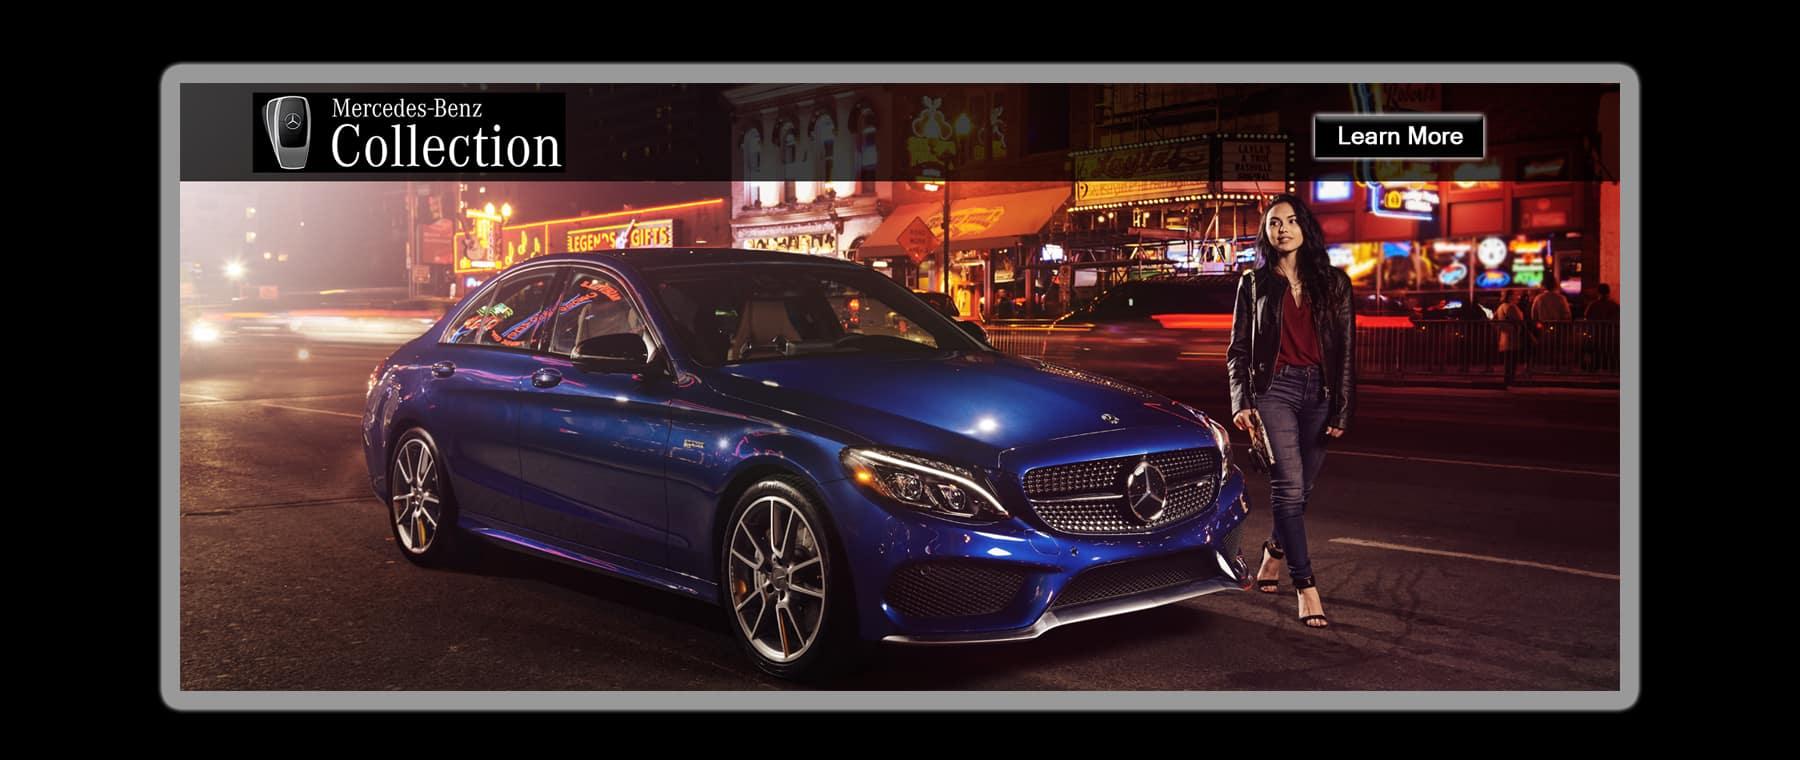 Mercedes-Benz of Music City Dealership in Nashville, TN